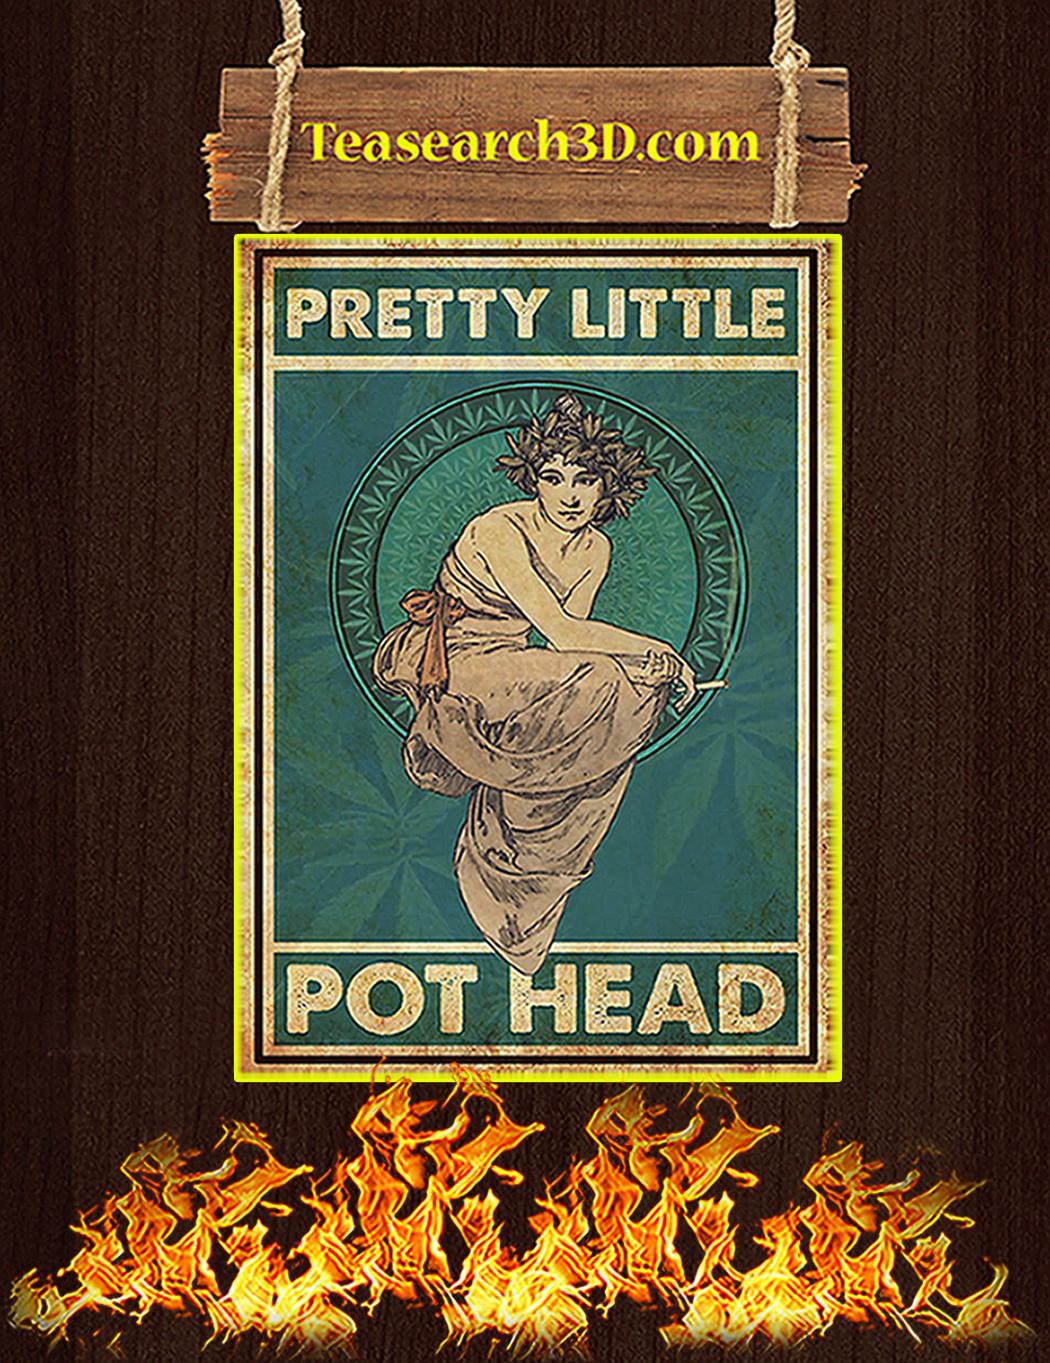 Pretty little pot head poster A1